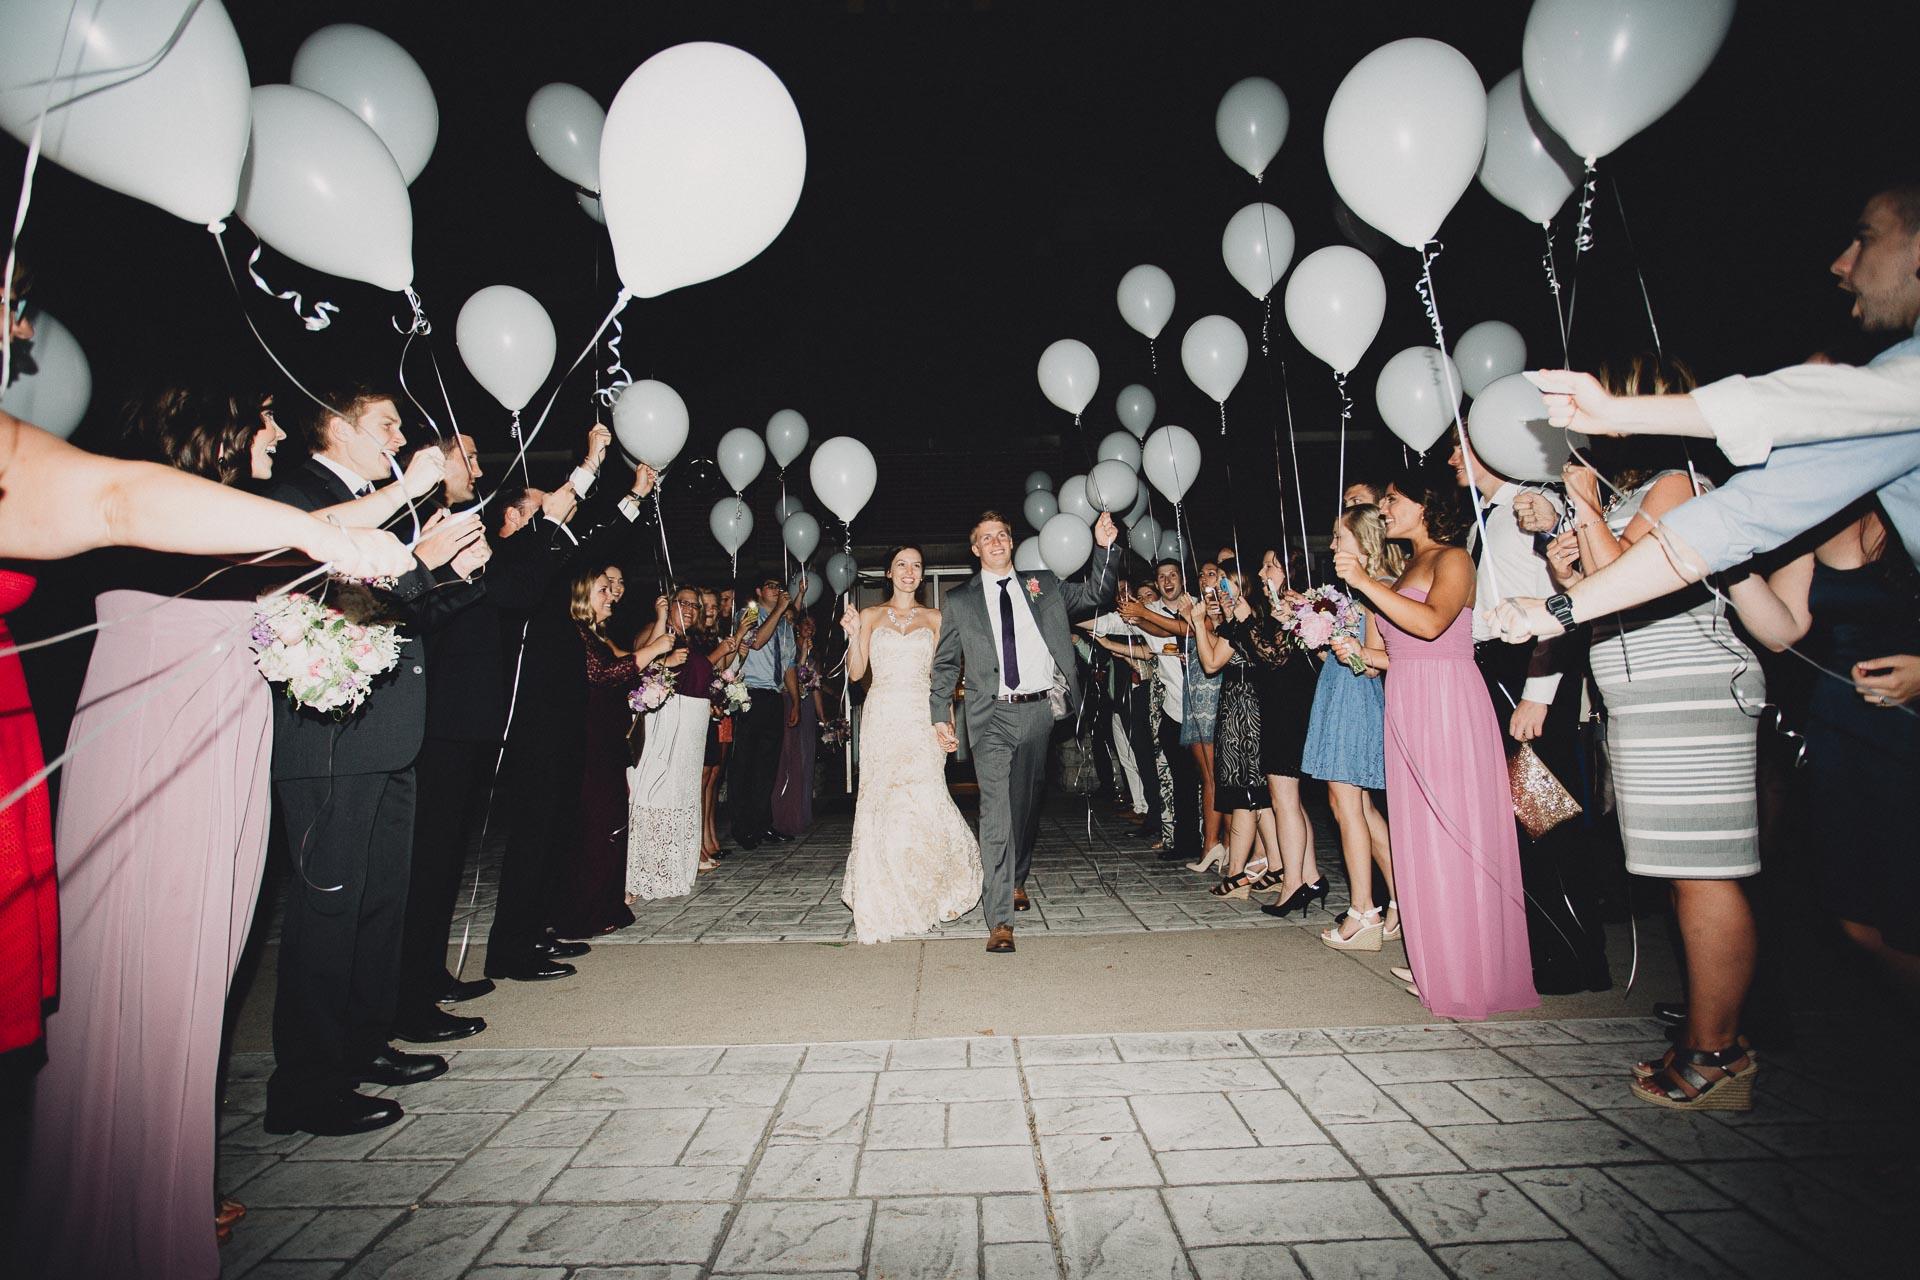 Julia-Michael-Cincinnati-Music-Hall-Wedding-144@2x.jpg